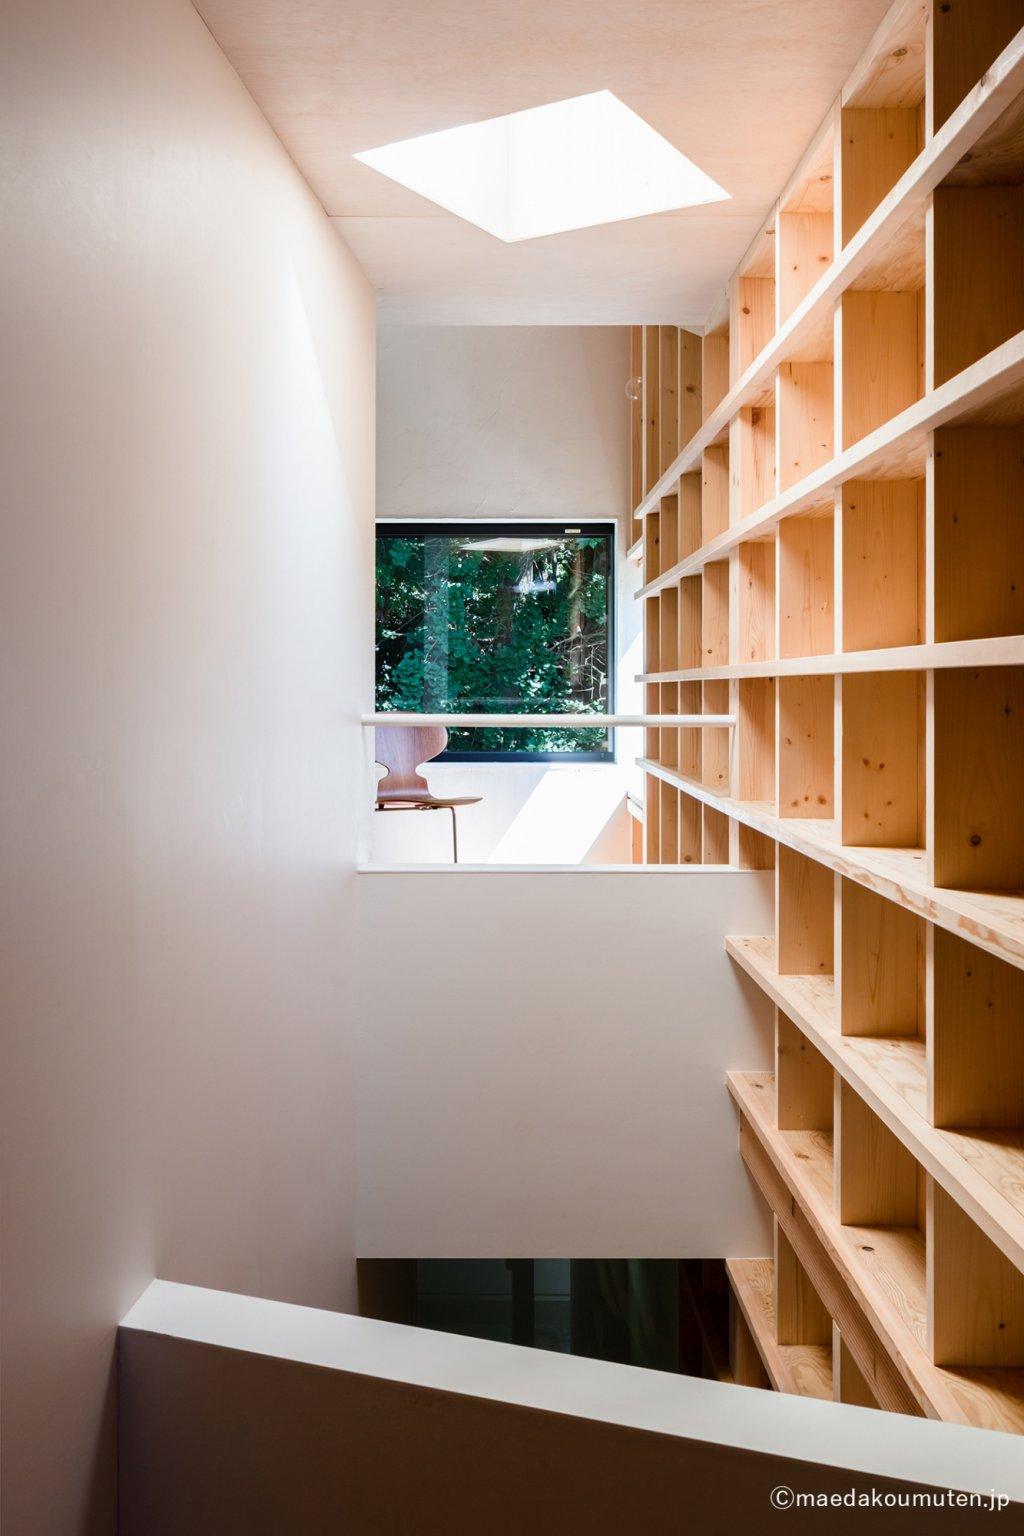 神奈川、工務店、注文住宅、デザイン住宅、建築家、亀井野の家、23